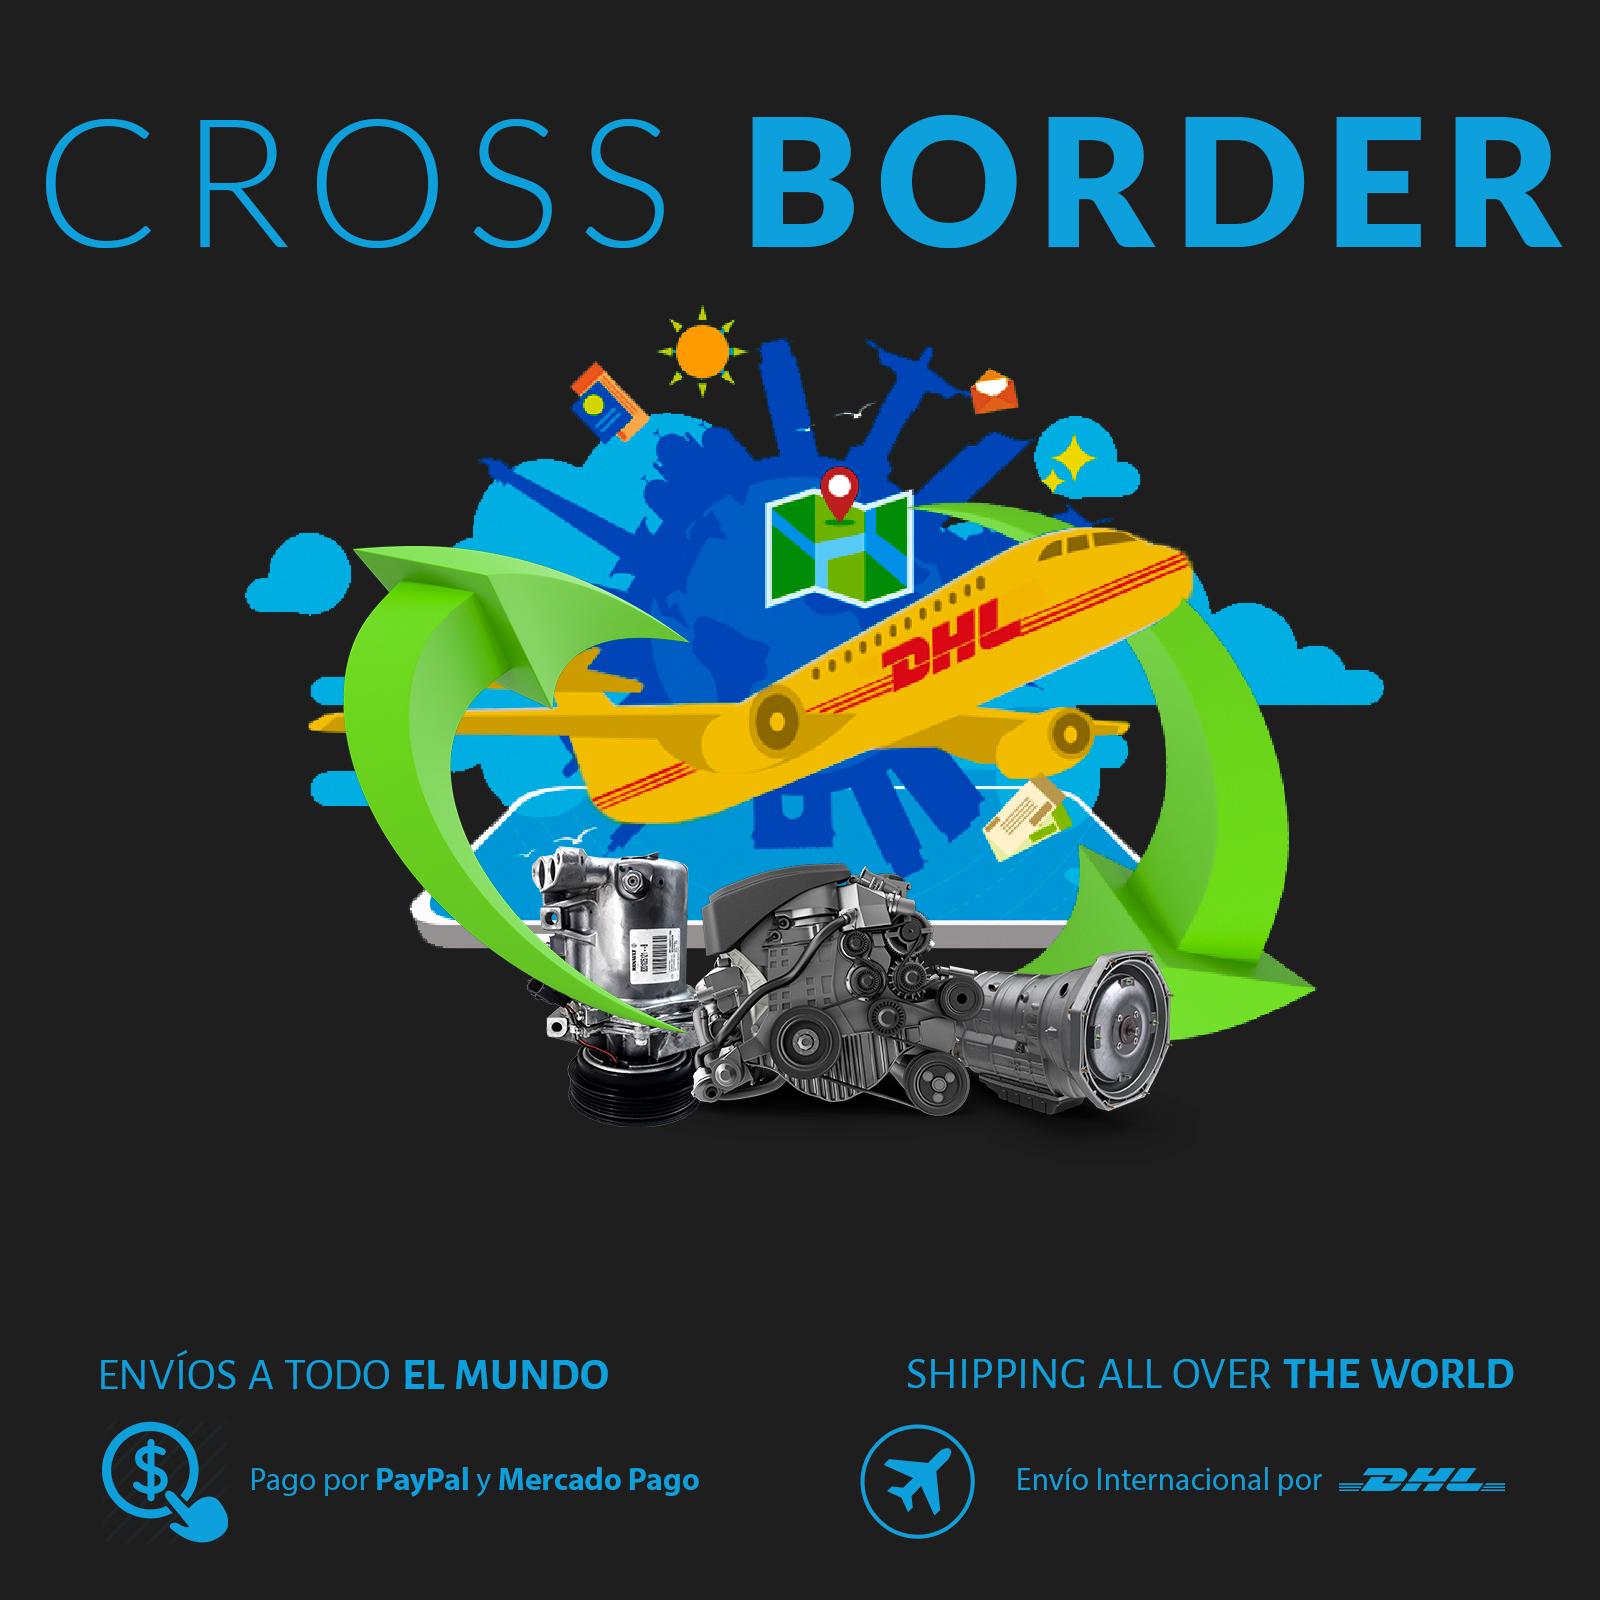 Crossborder